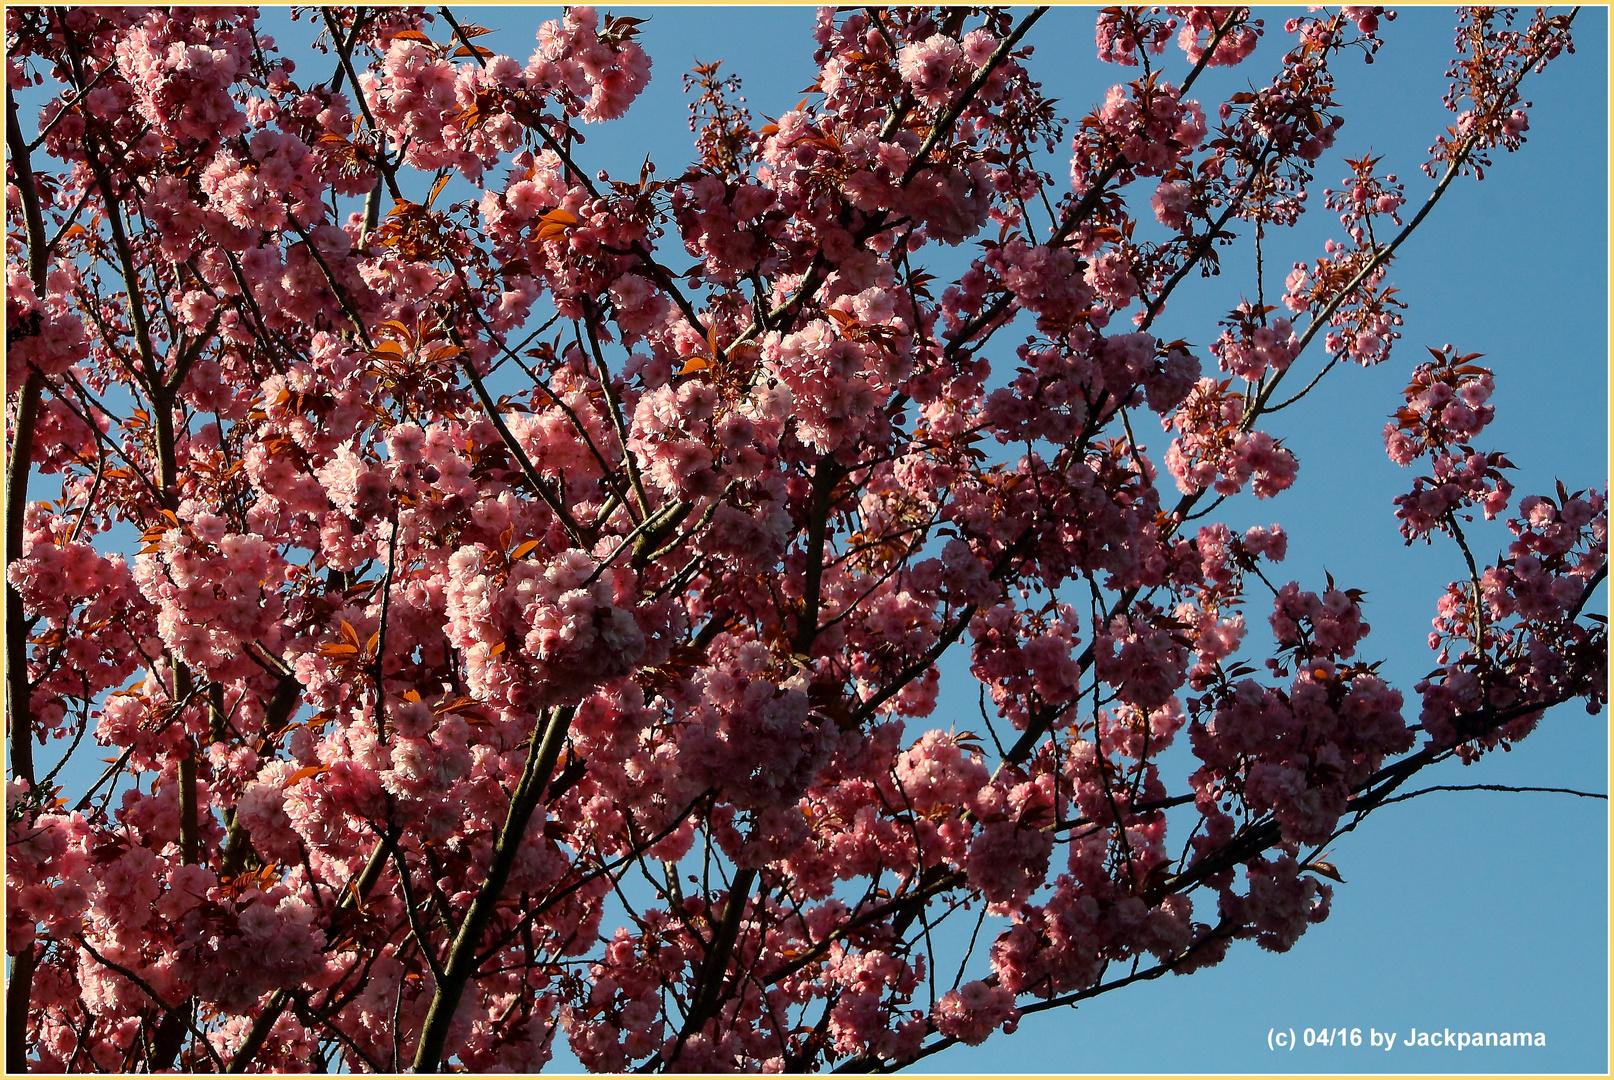 Kirschen japanische Japanische Blüten